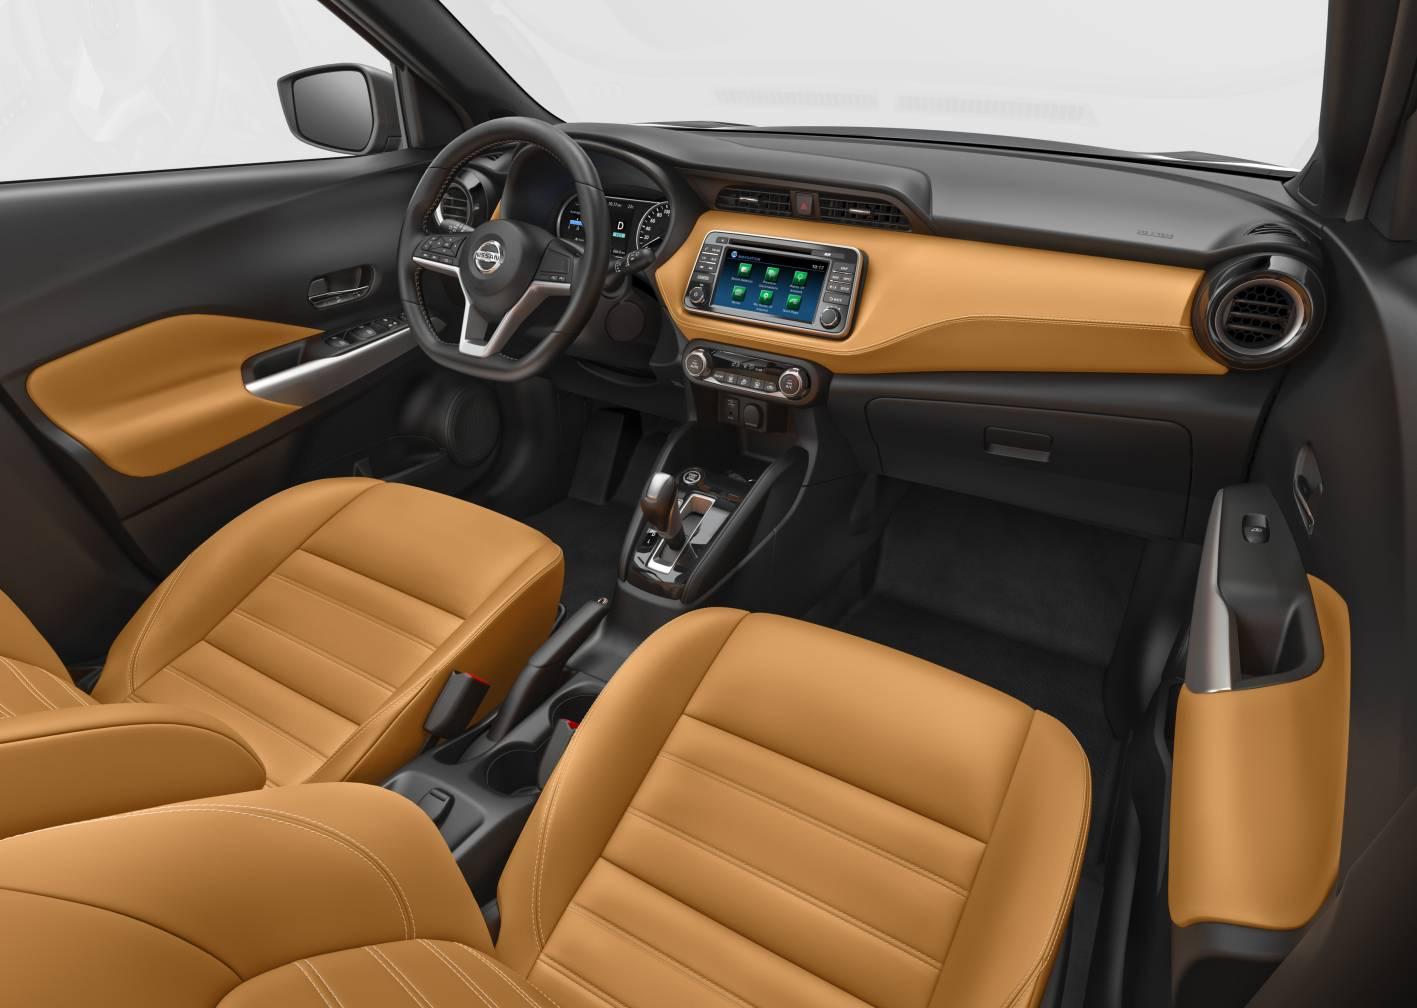 2016 Nissan Juke >> Nissan News: Nissan Kicks compact crossover goes into production